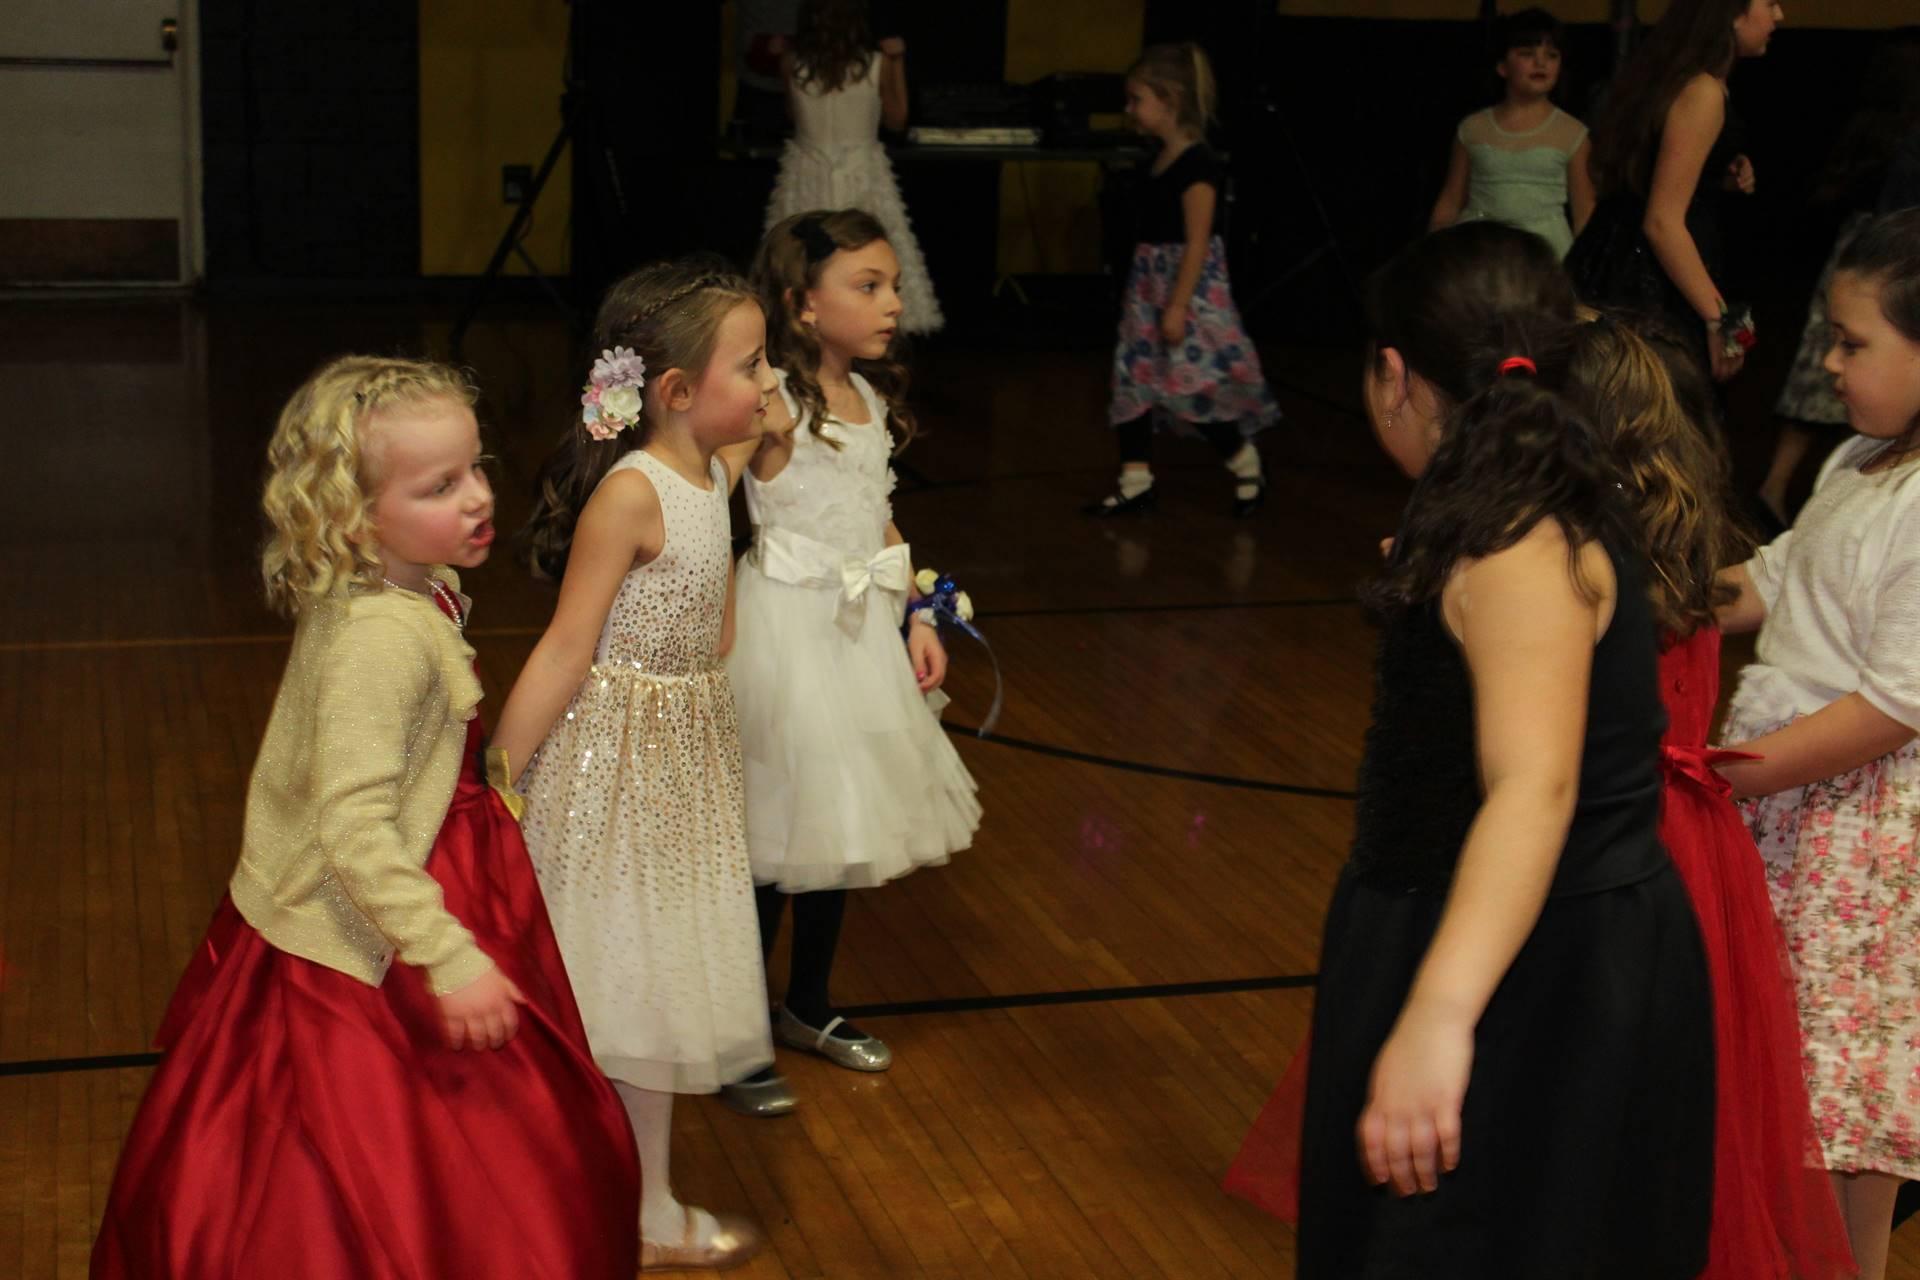 Dance Standoff